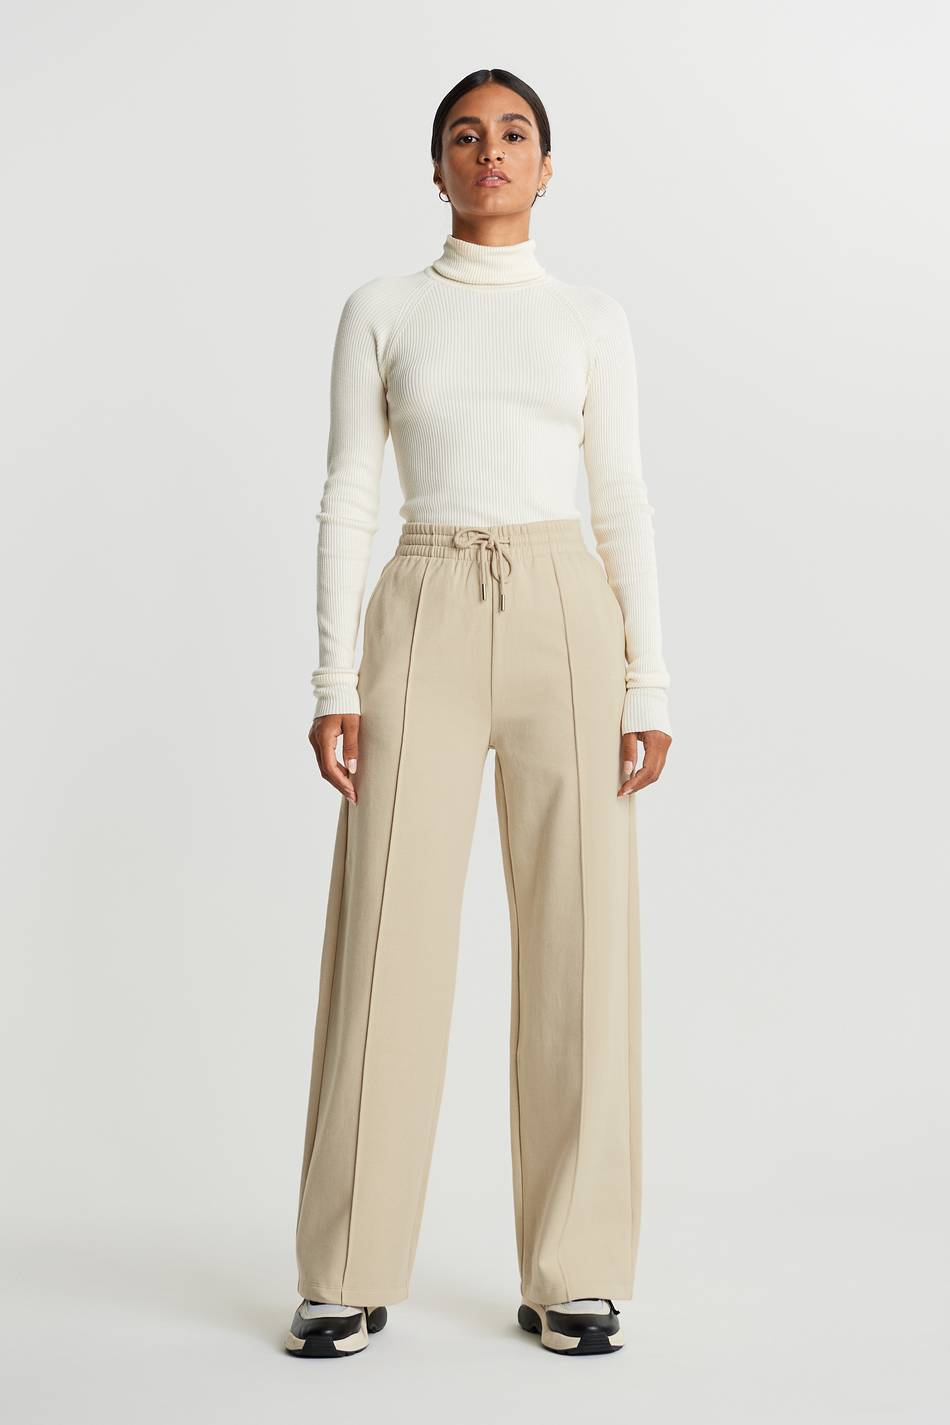 Gina Tricot Bonnie sweatpants XL Female Brown rice (7316)